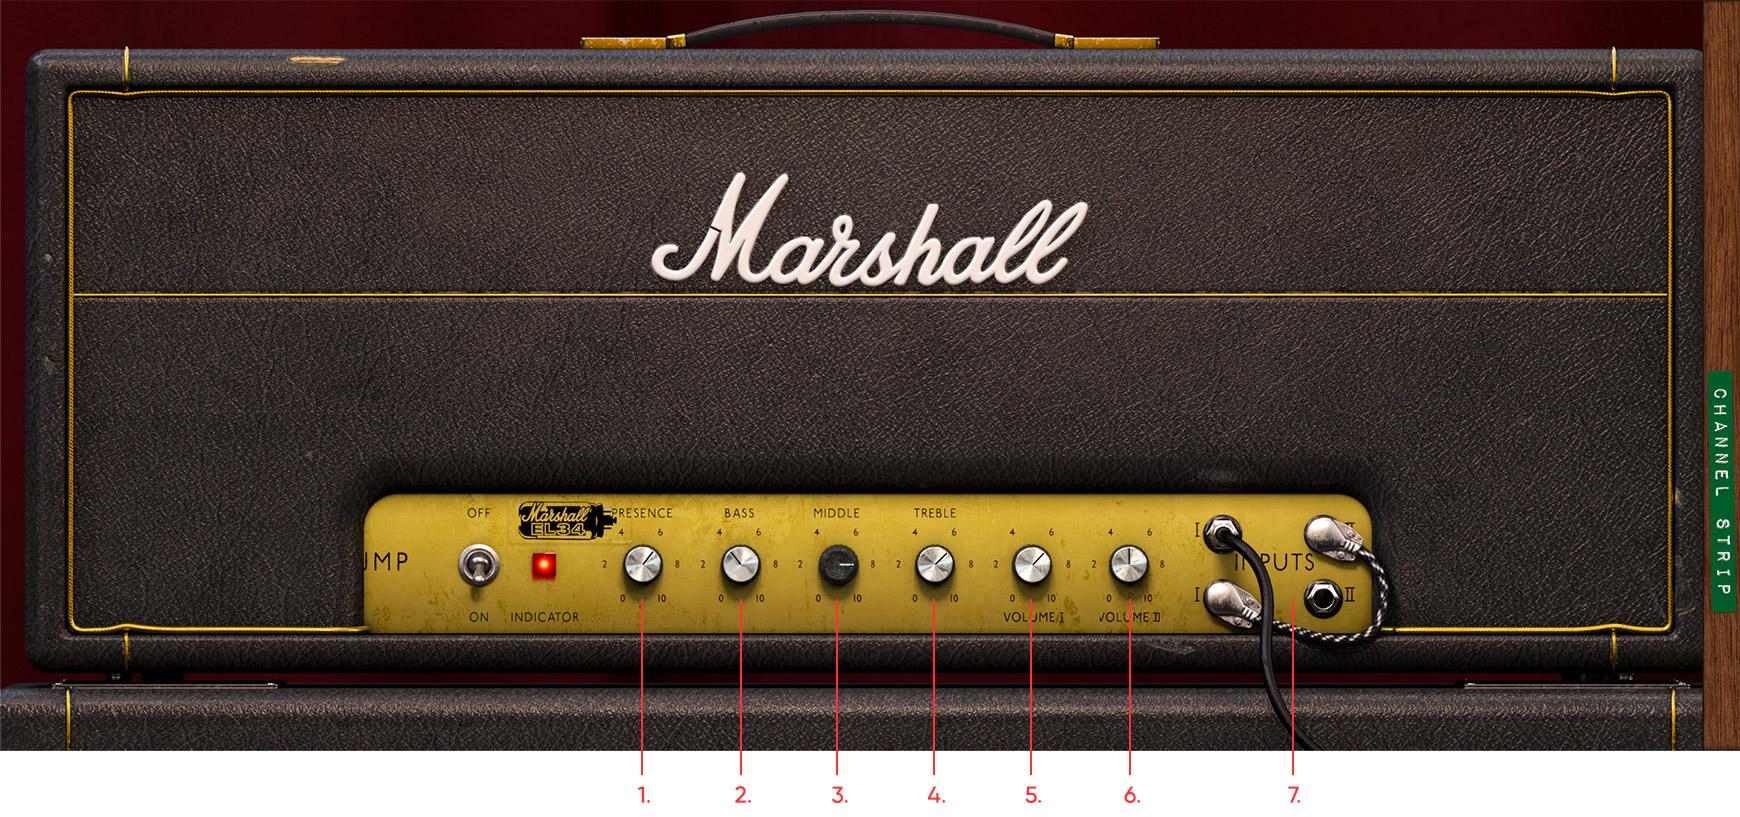 marshall-plexi-classic-user-interface.jpg